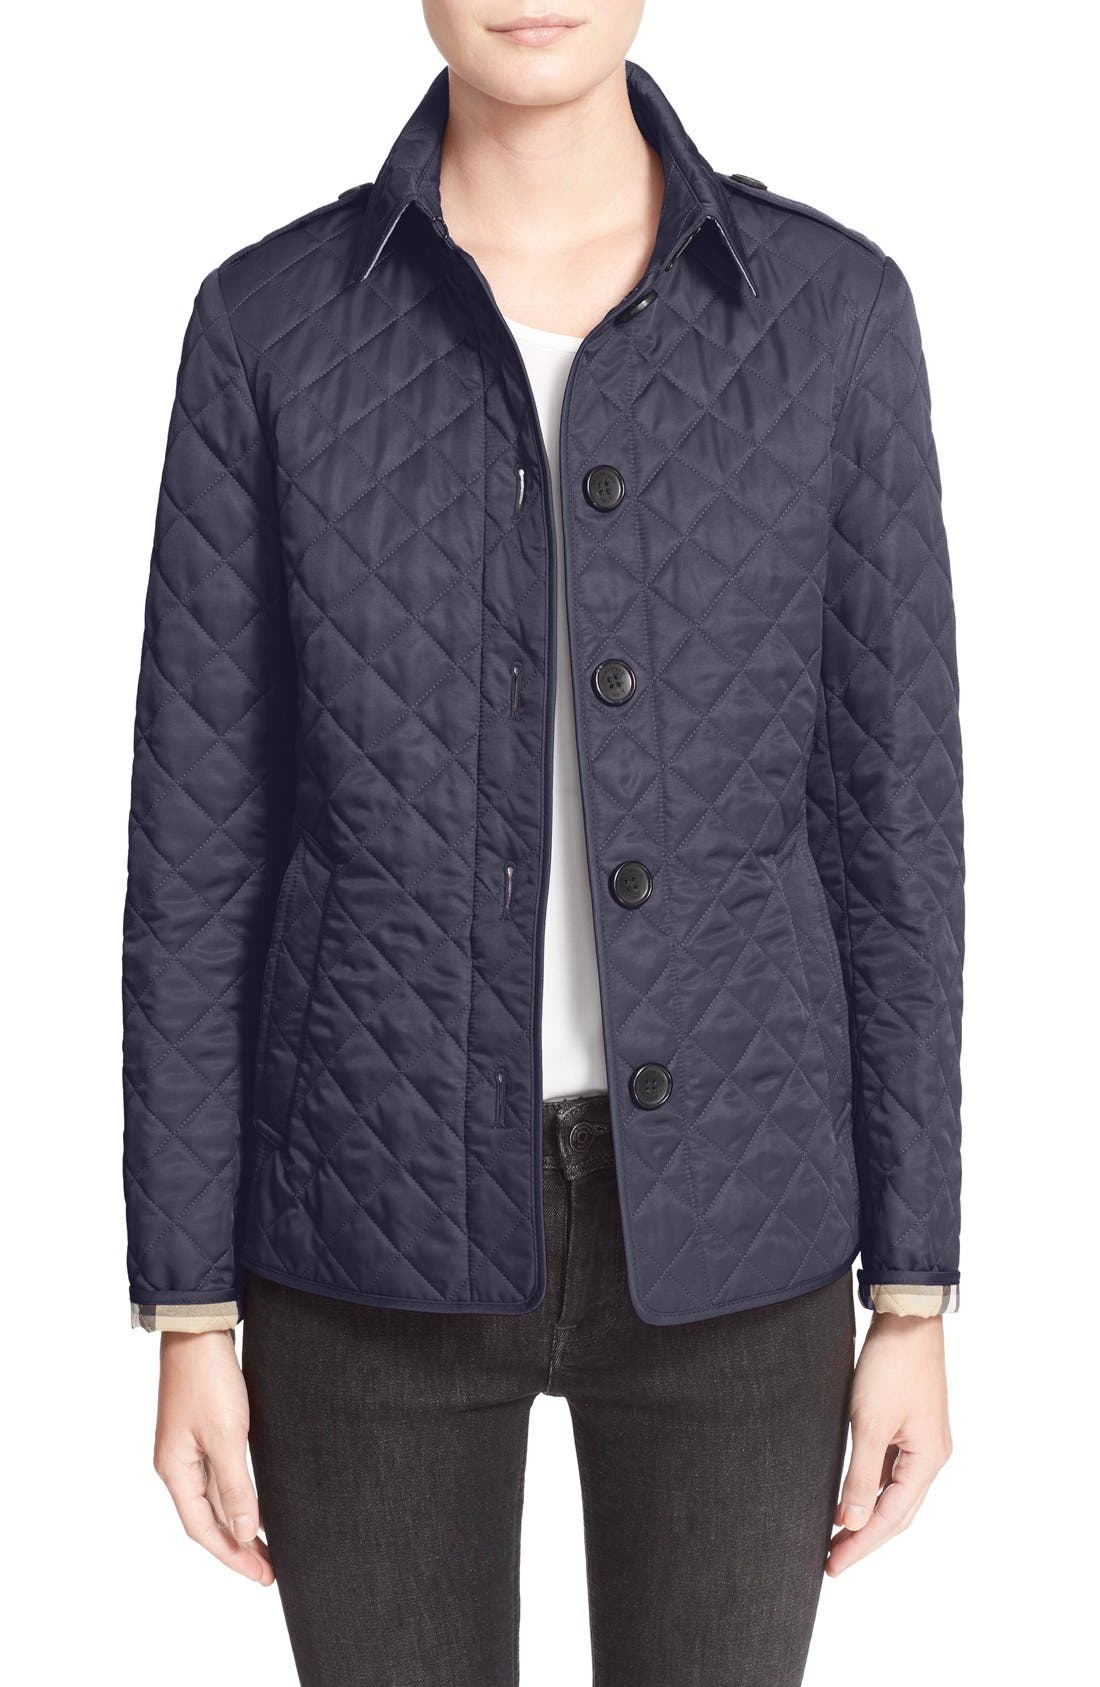 Burberry black spring jacket